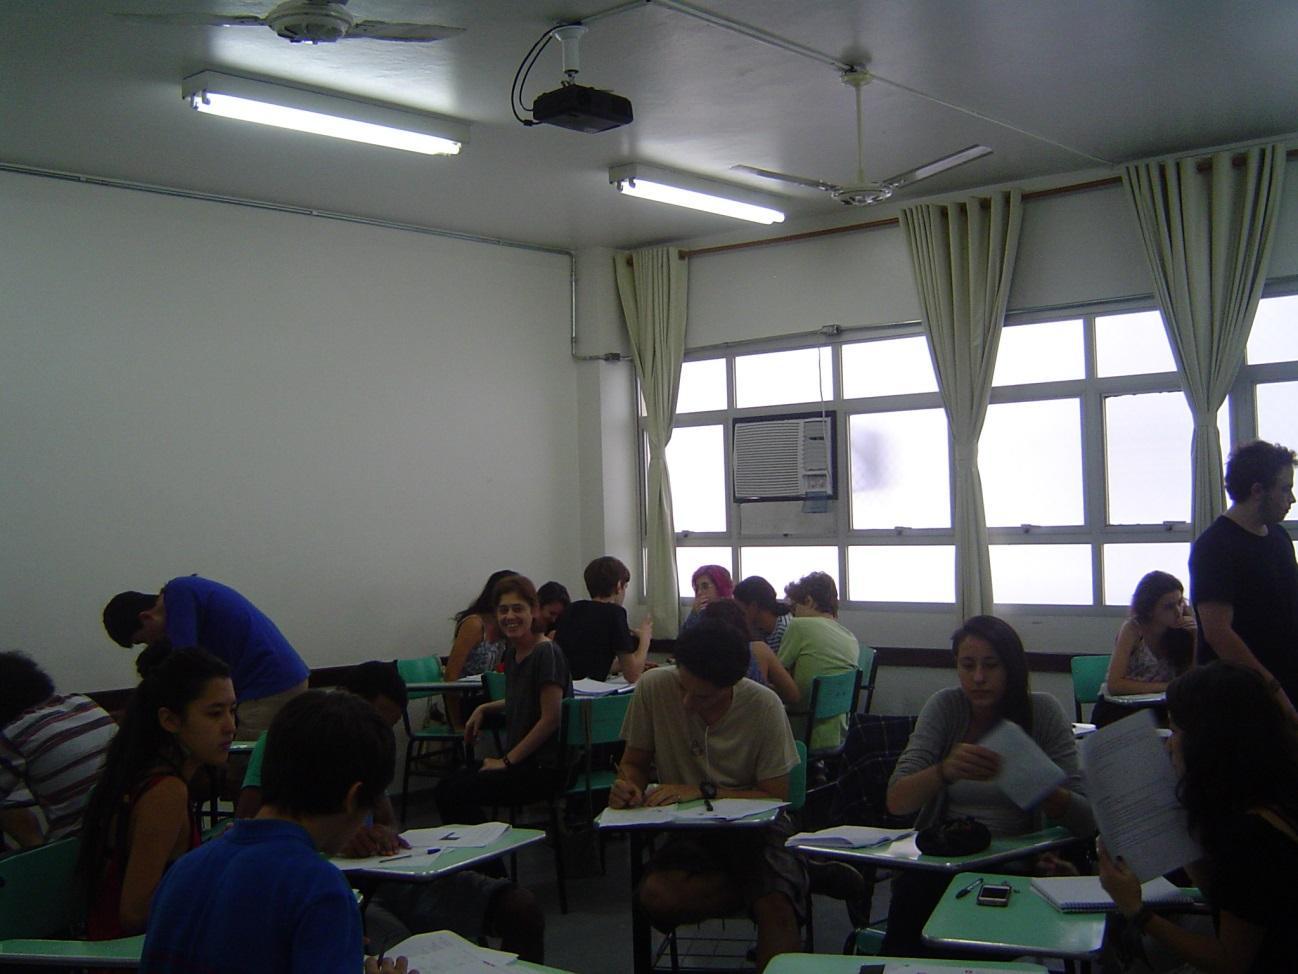 orientacoes_de_estudo_de_matematica_no_curriculo_da_1_serie_002